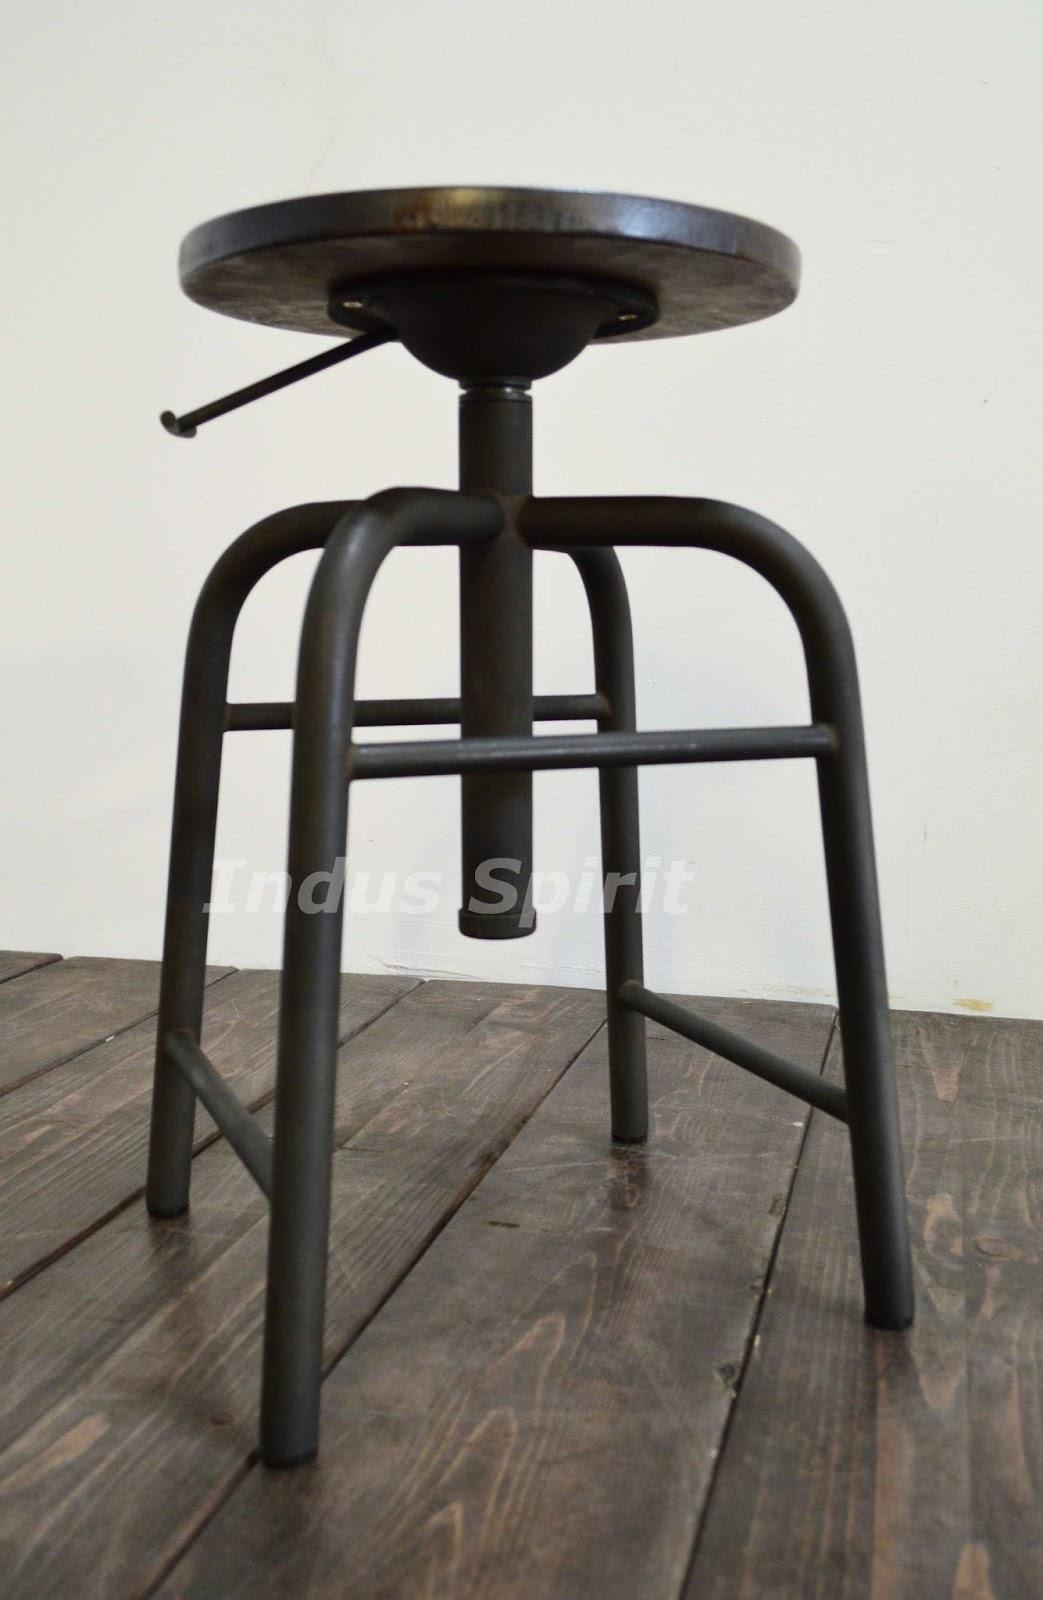 tabouret industriel ancien bande transporteuse caoutchouc. Black Bedroom Furniture Sets. Home Design Ideas